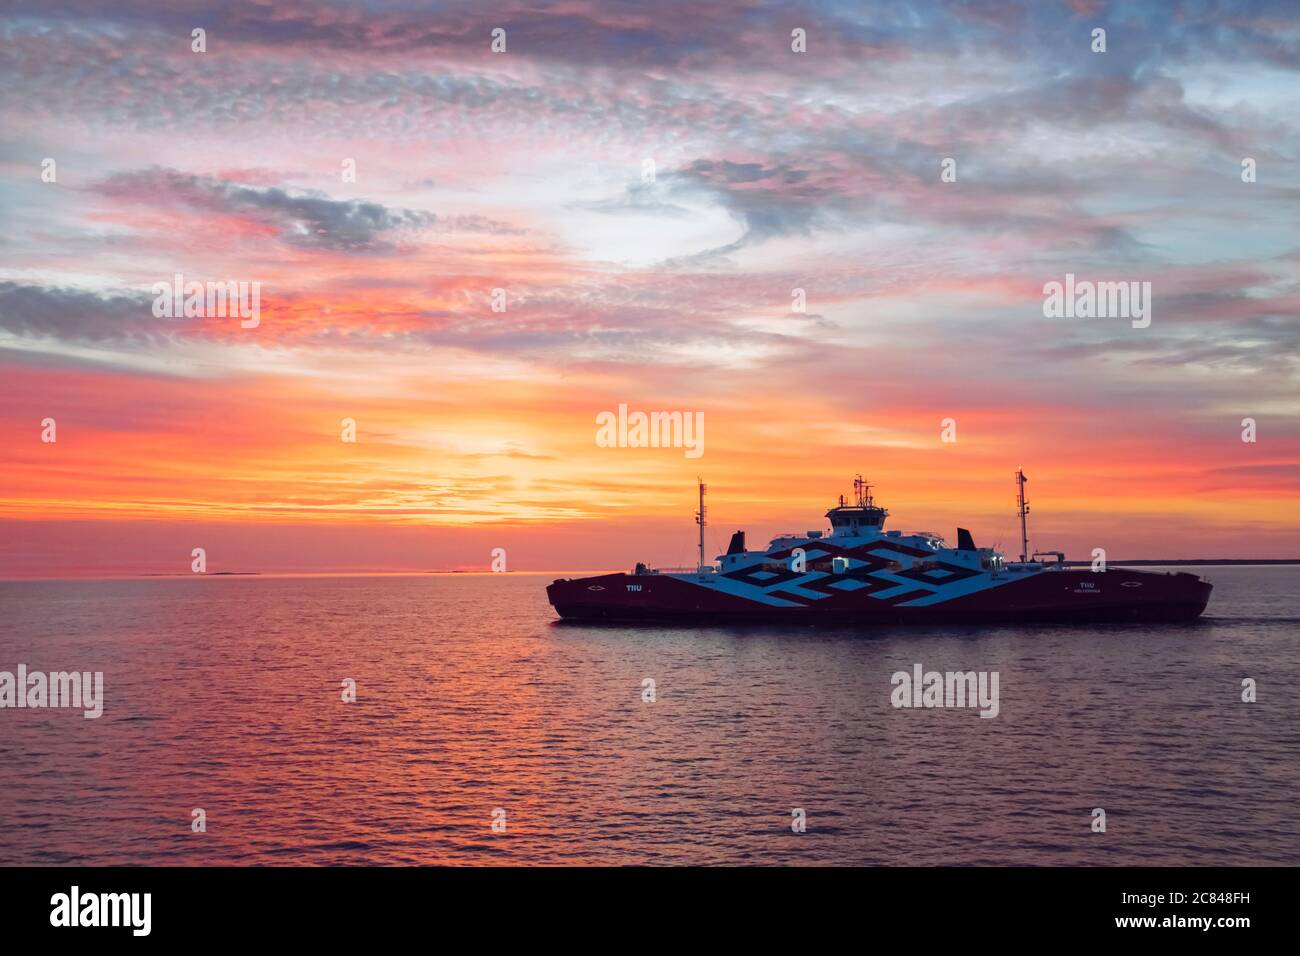 Mar Baltico, Hiiumaa/Estonia-19JUL2020: Traghetto chiamato Tiiu tra Hiiumaa (porto di Heltermaa) e l'Estonia continentale ( Rohuküla, Rohukula) in mare. Foto Stock